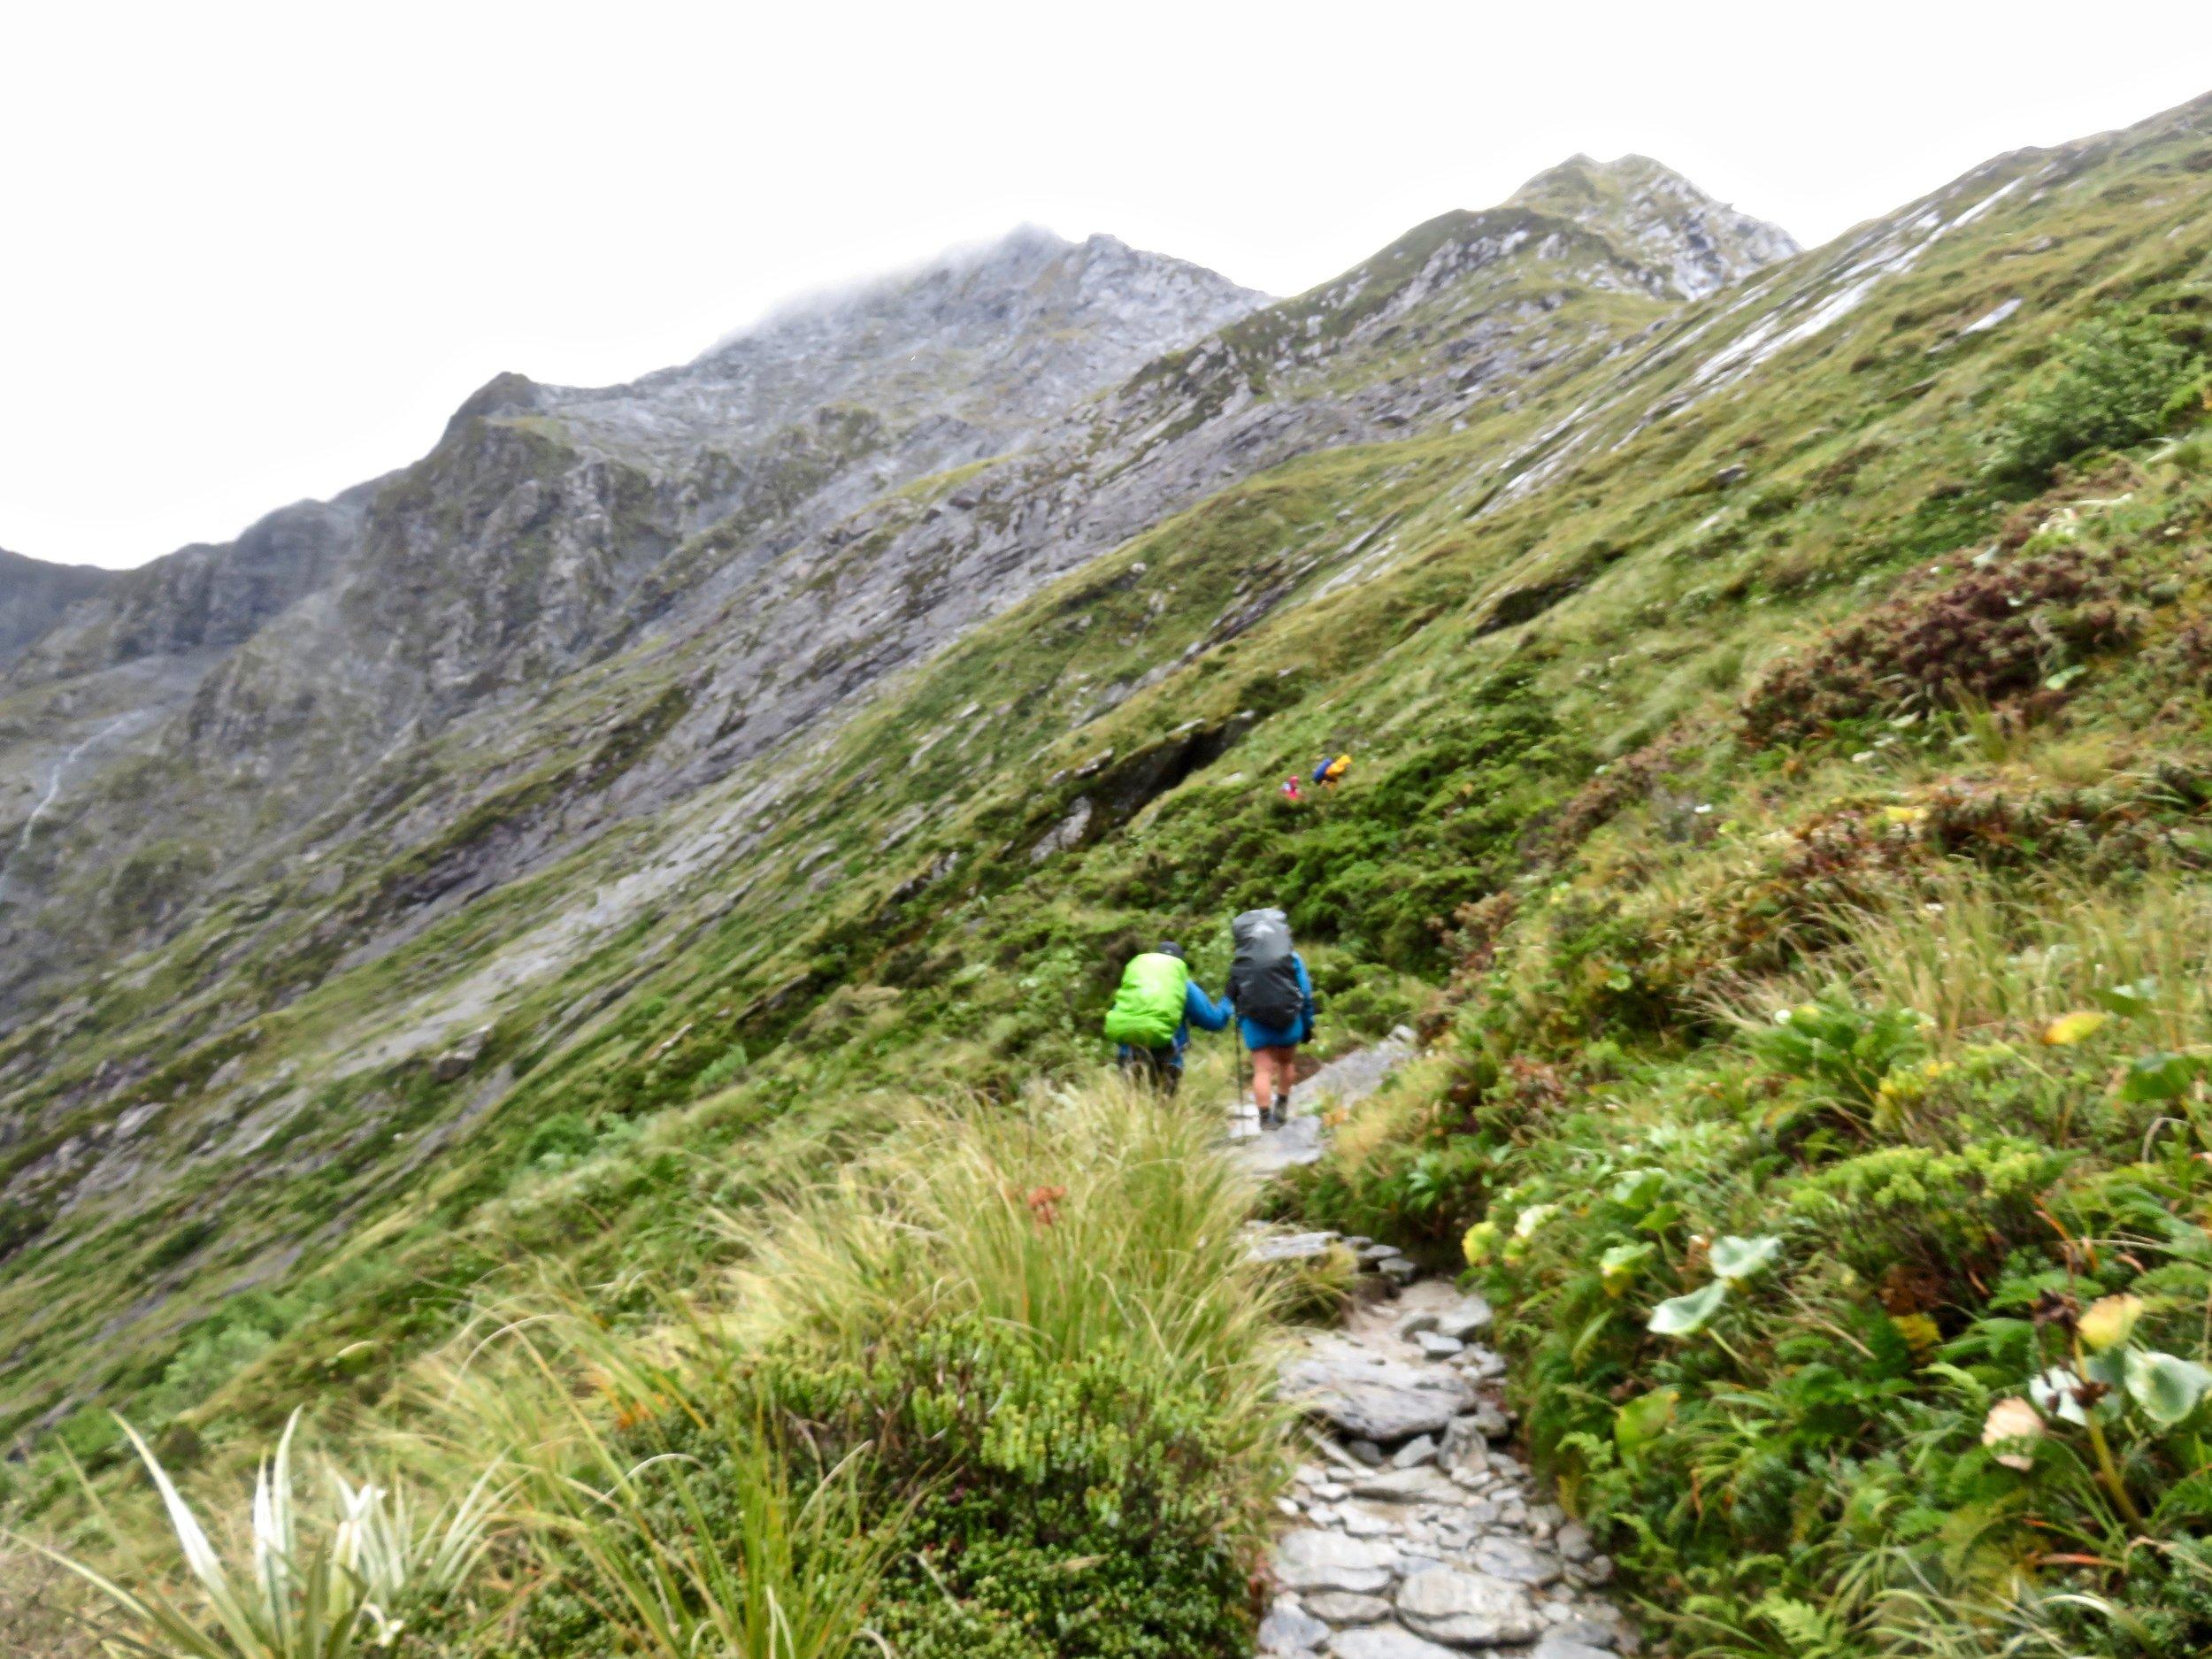 Heading for summit of MacKinnon's Pass